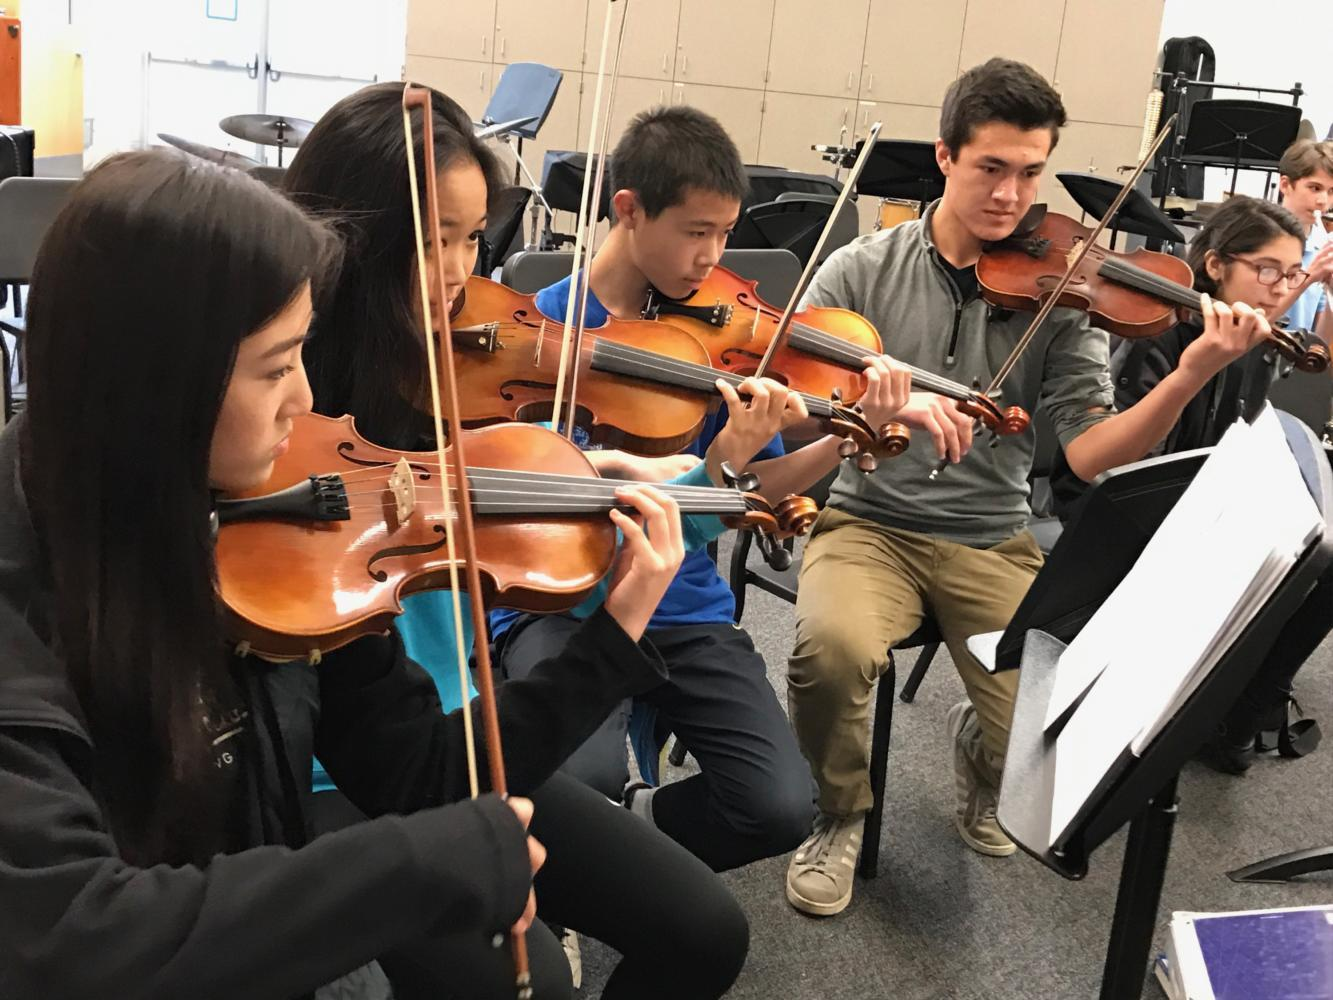 Freshmen Denise Zhou, Selena Sun, and Vernon Luk practice their part in